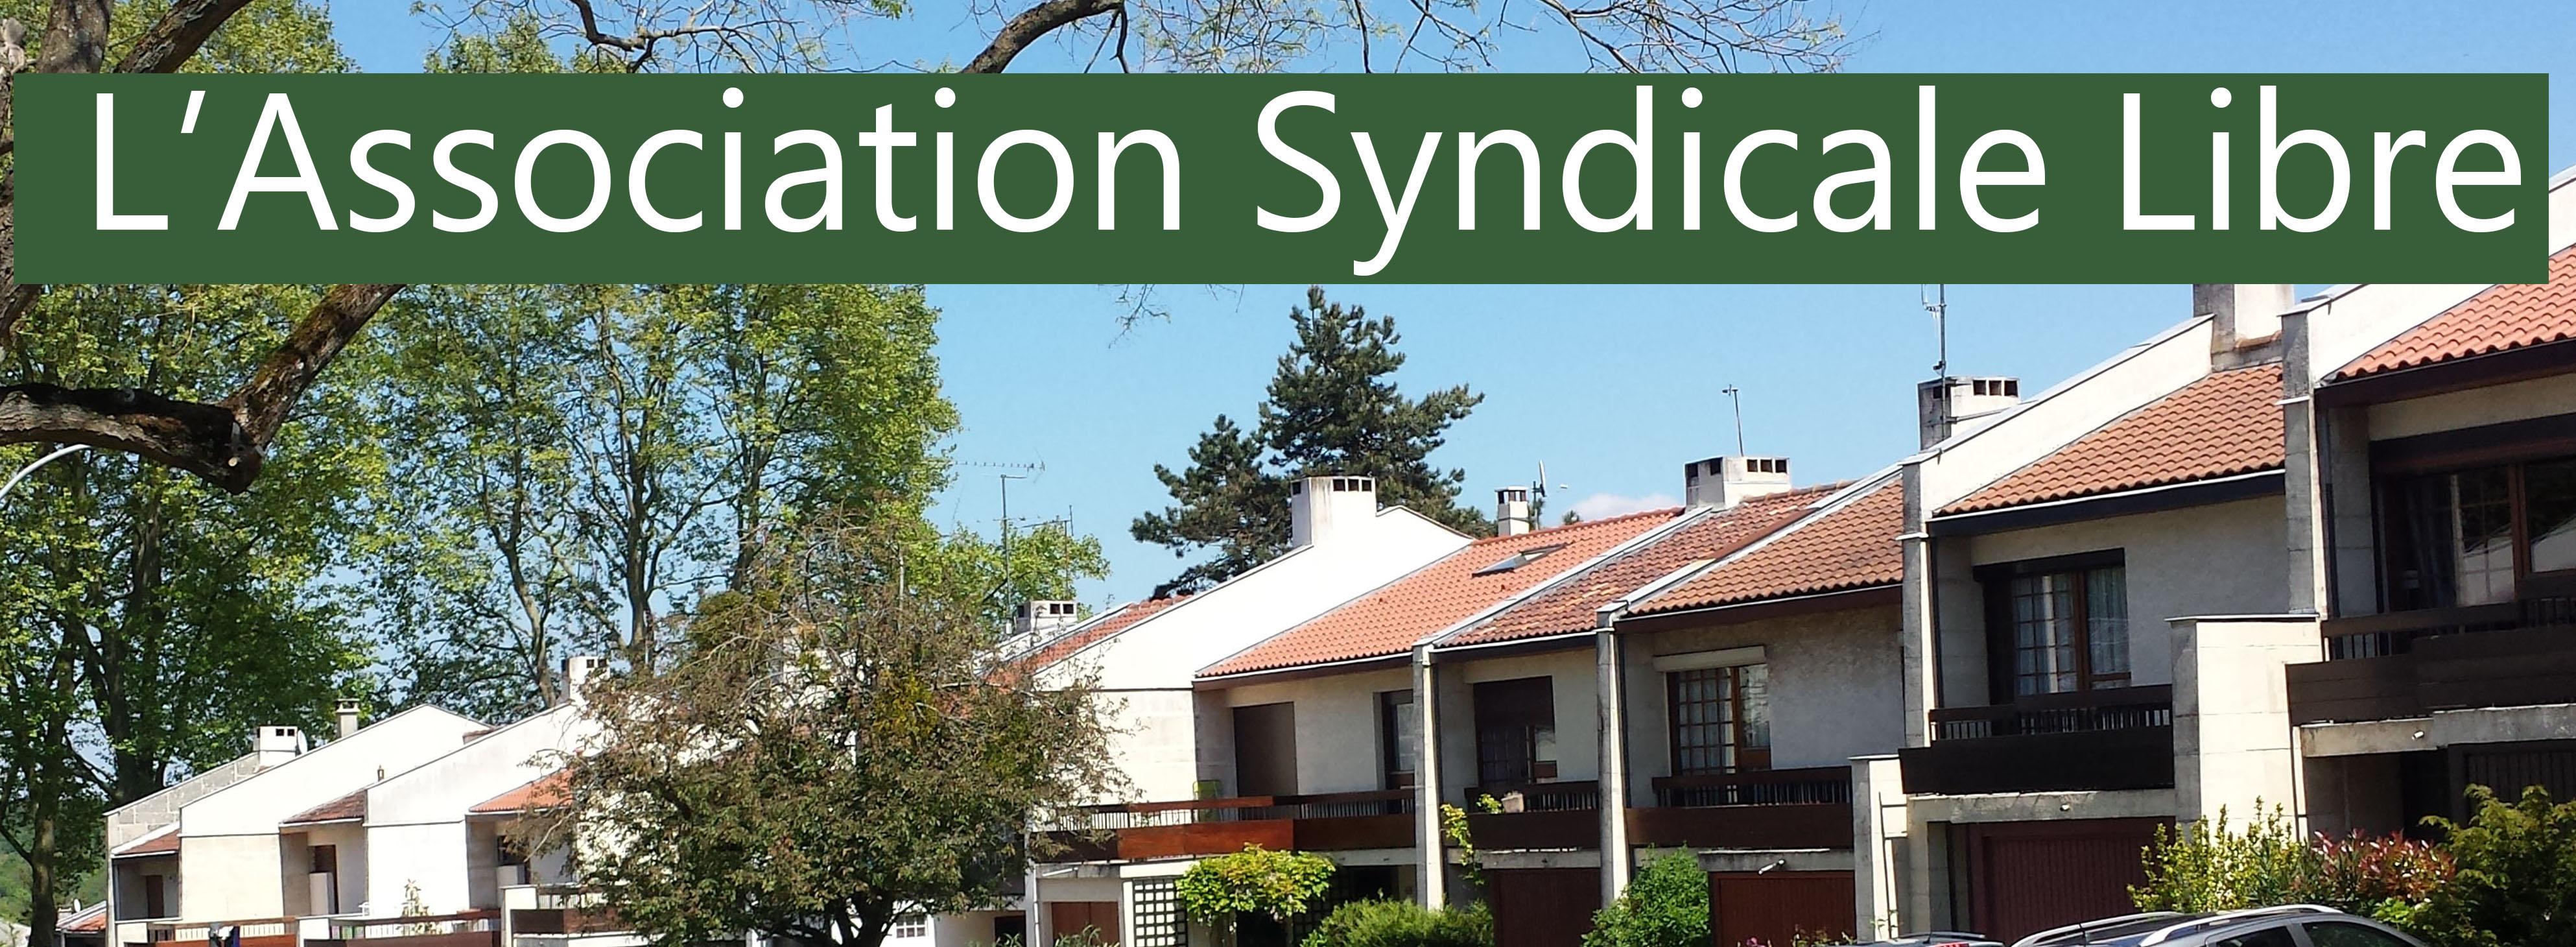 2017-ASL-association-syndicale-libre